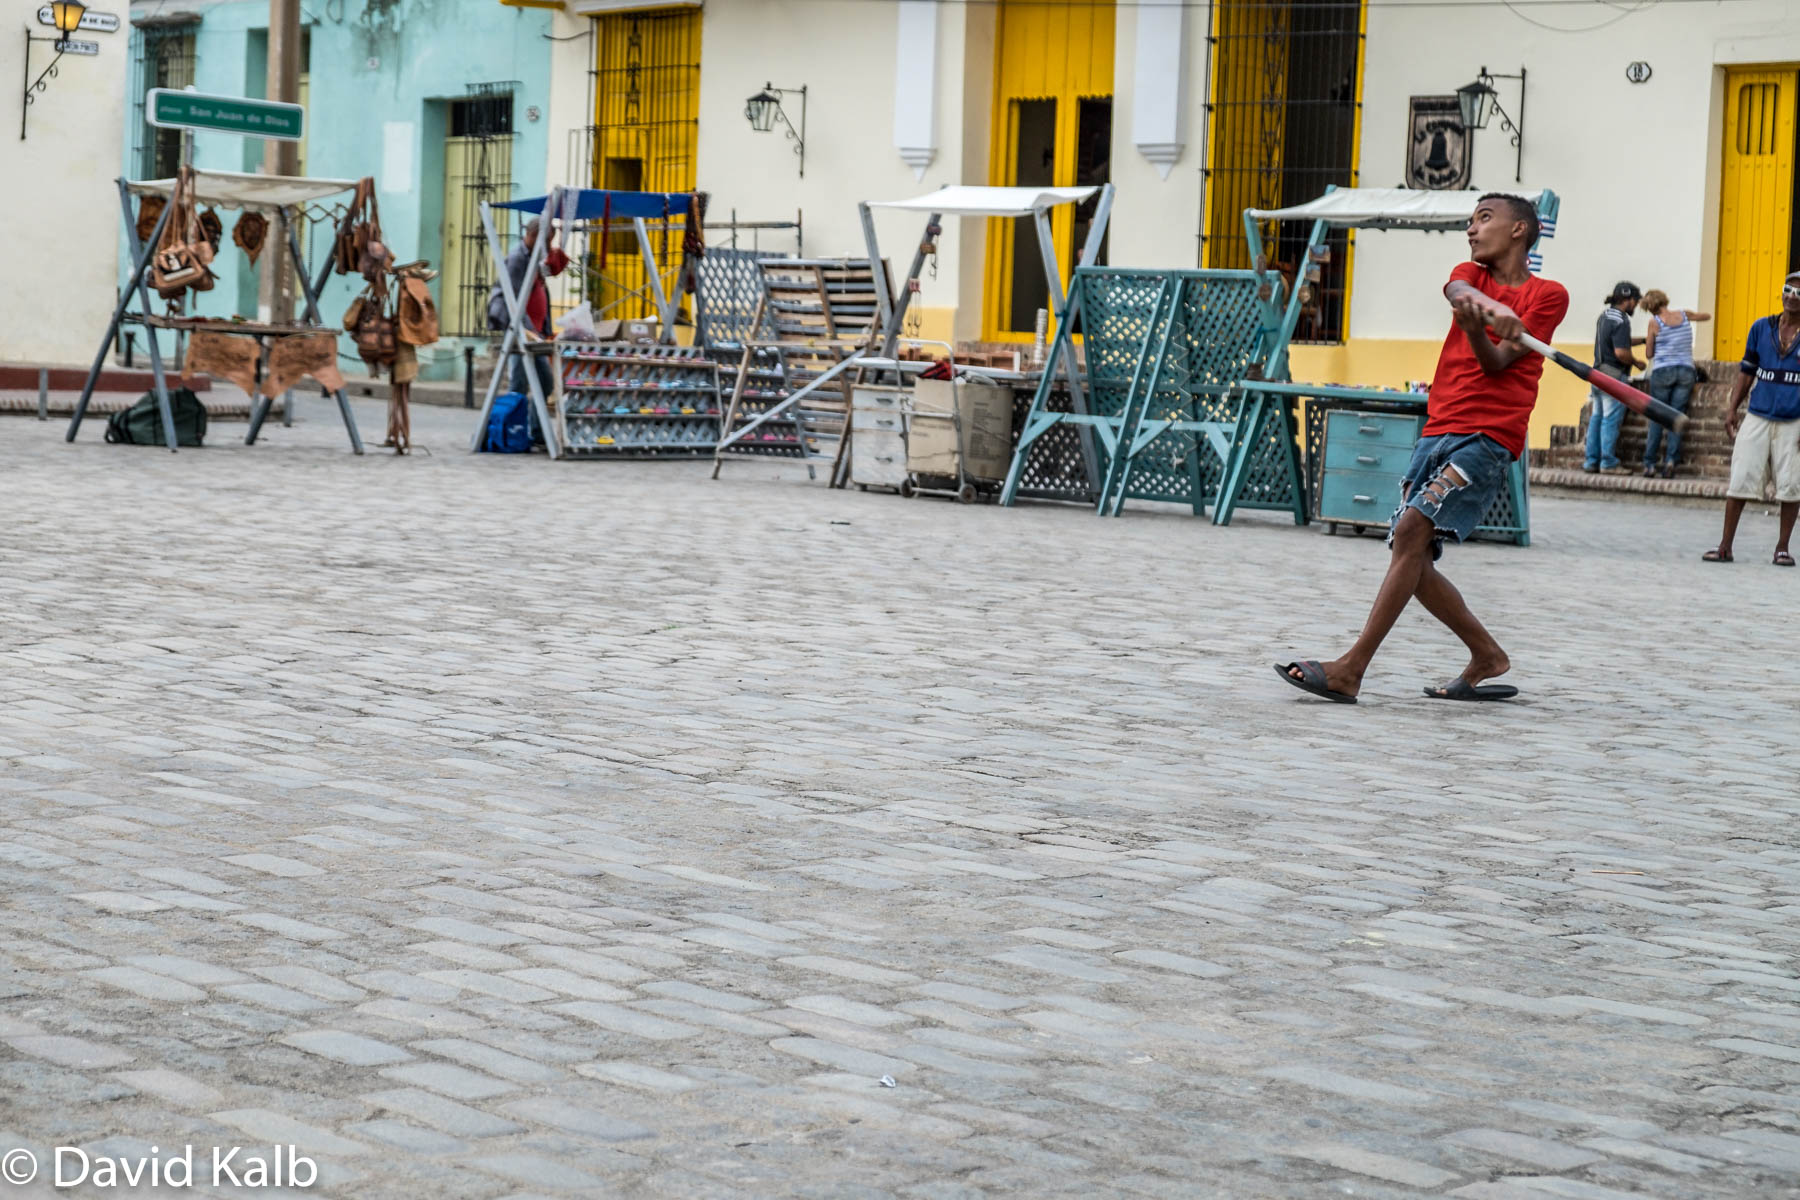 Cuba's National Sport Baseball